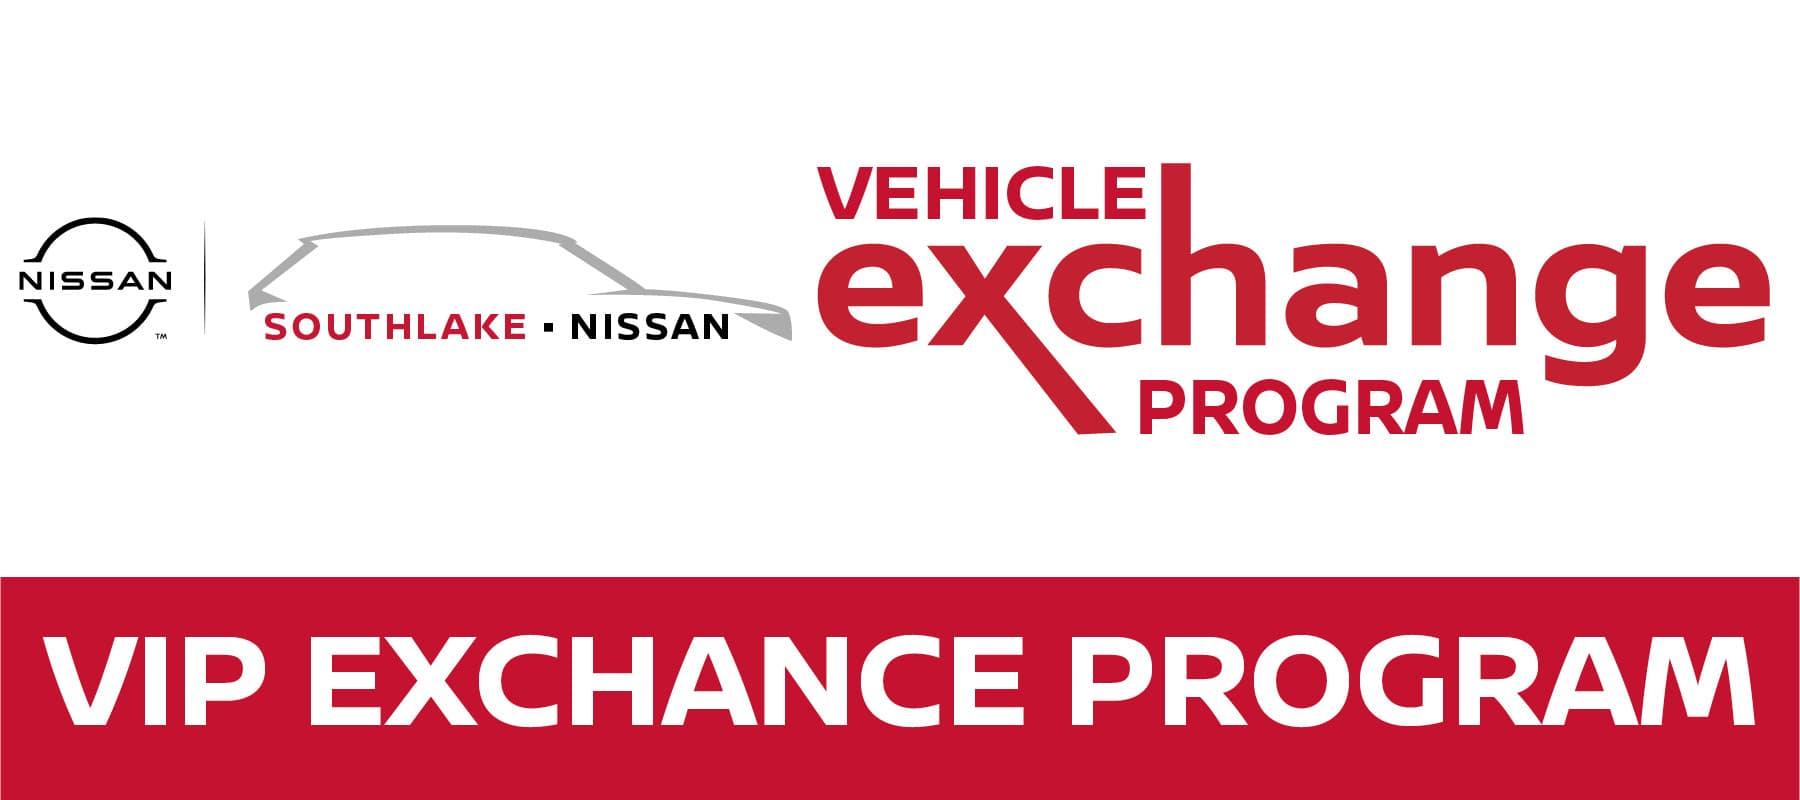 Vehcile Exchange Program